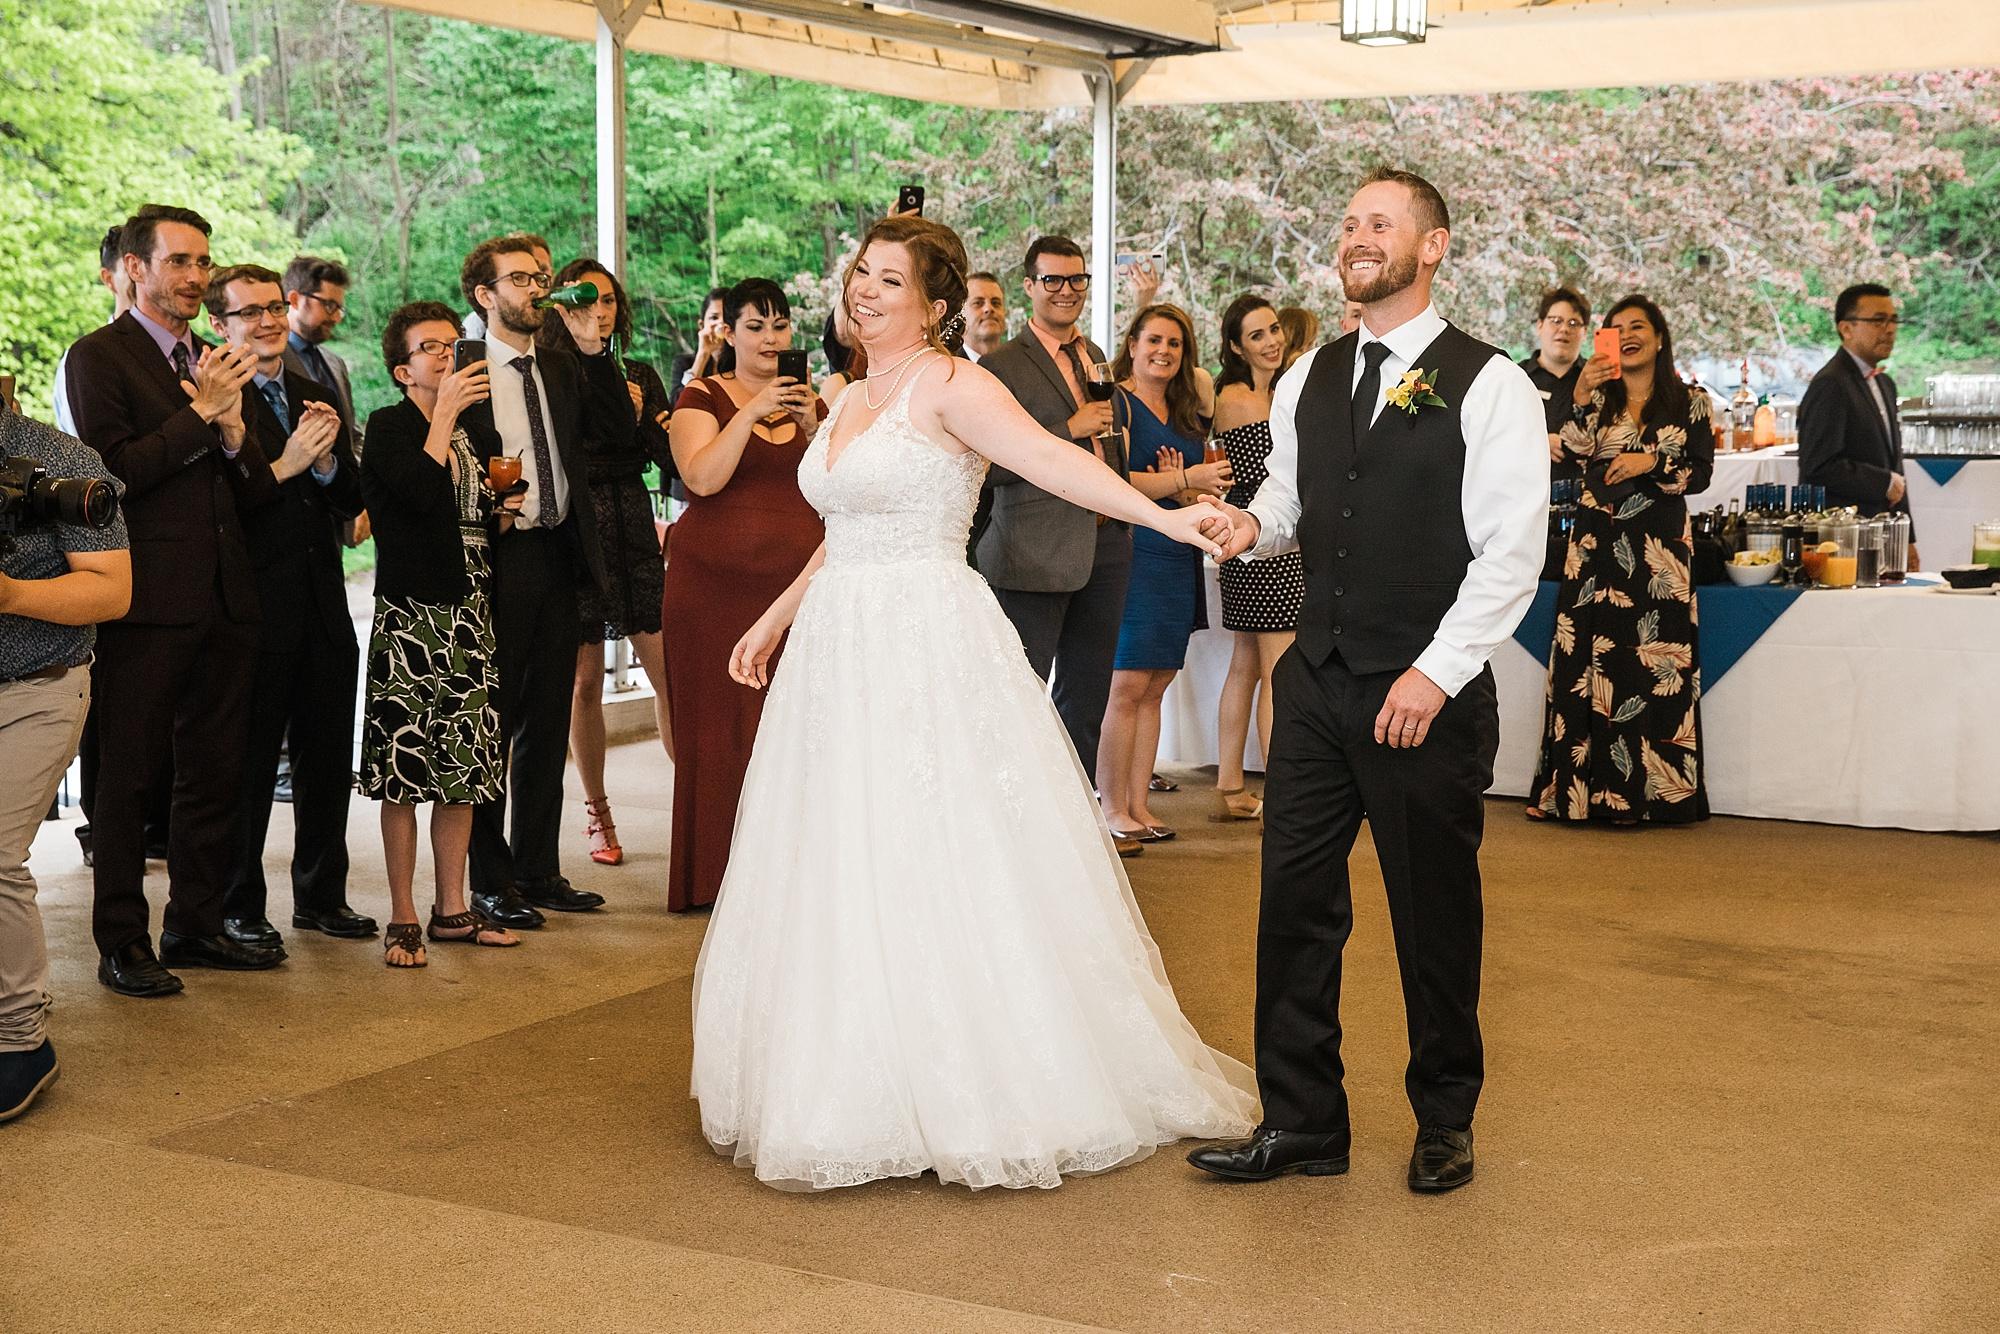 niagarafalls-weddingphotography_0061.jpg